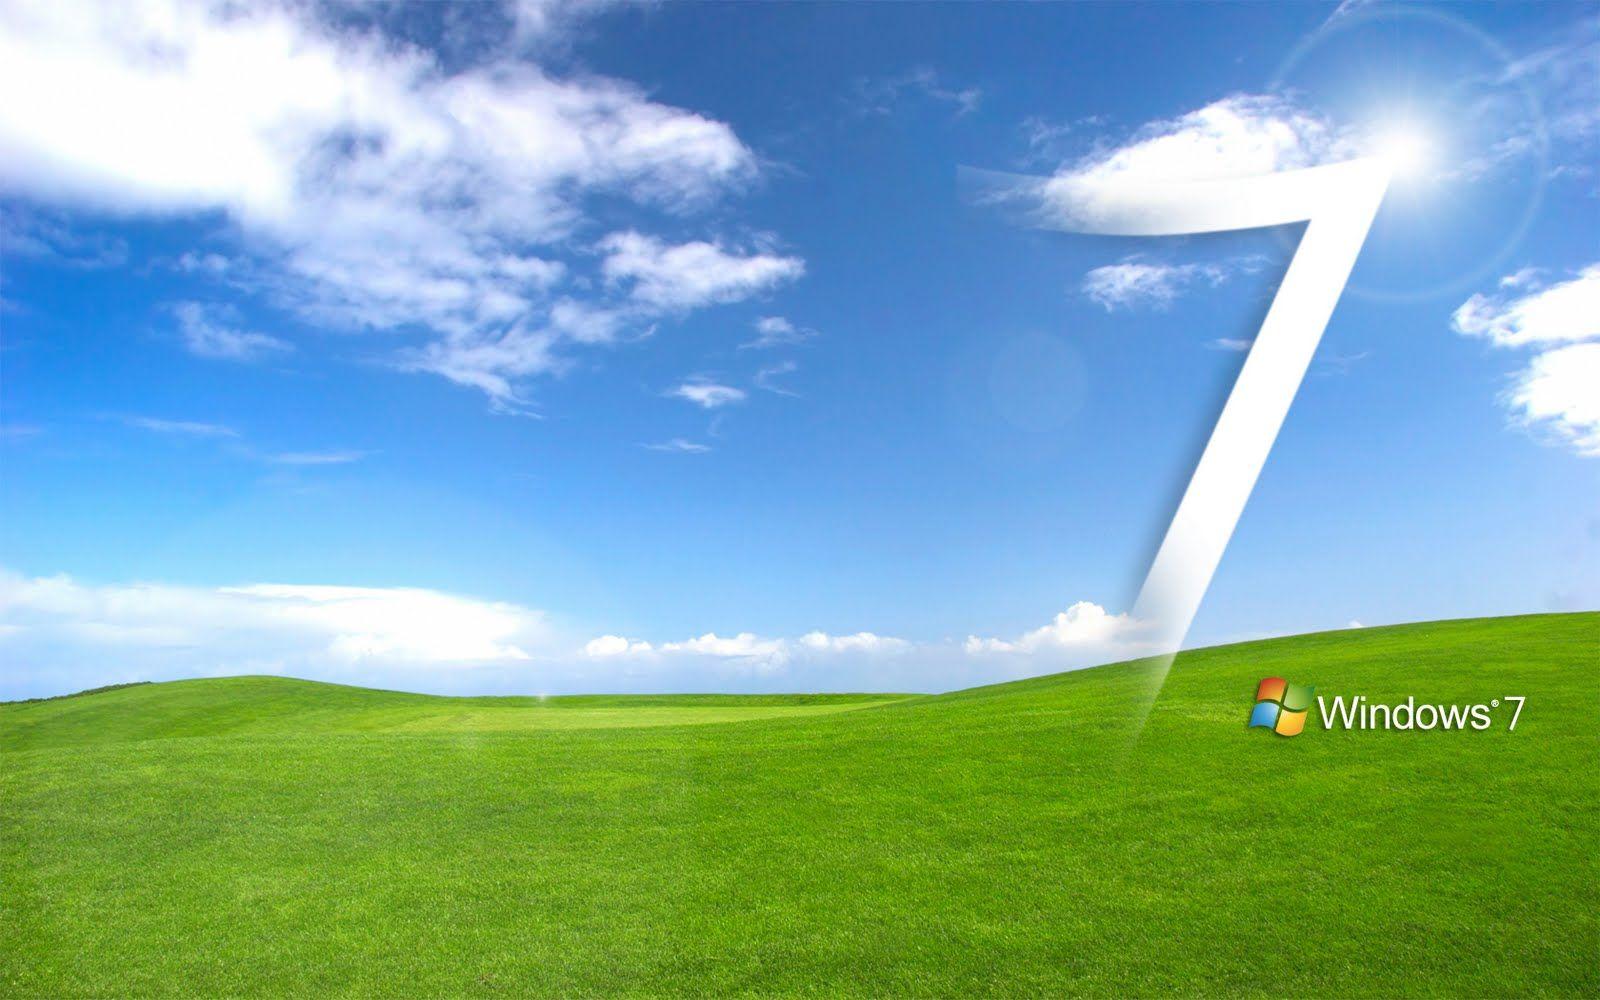 Windows Xp Bliss 1080p Posted By Samantha Johnson